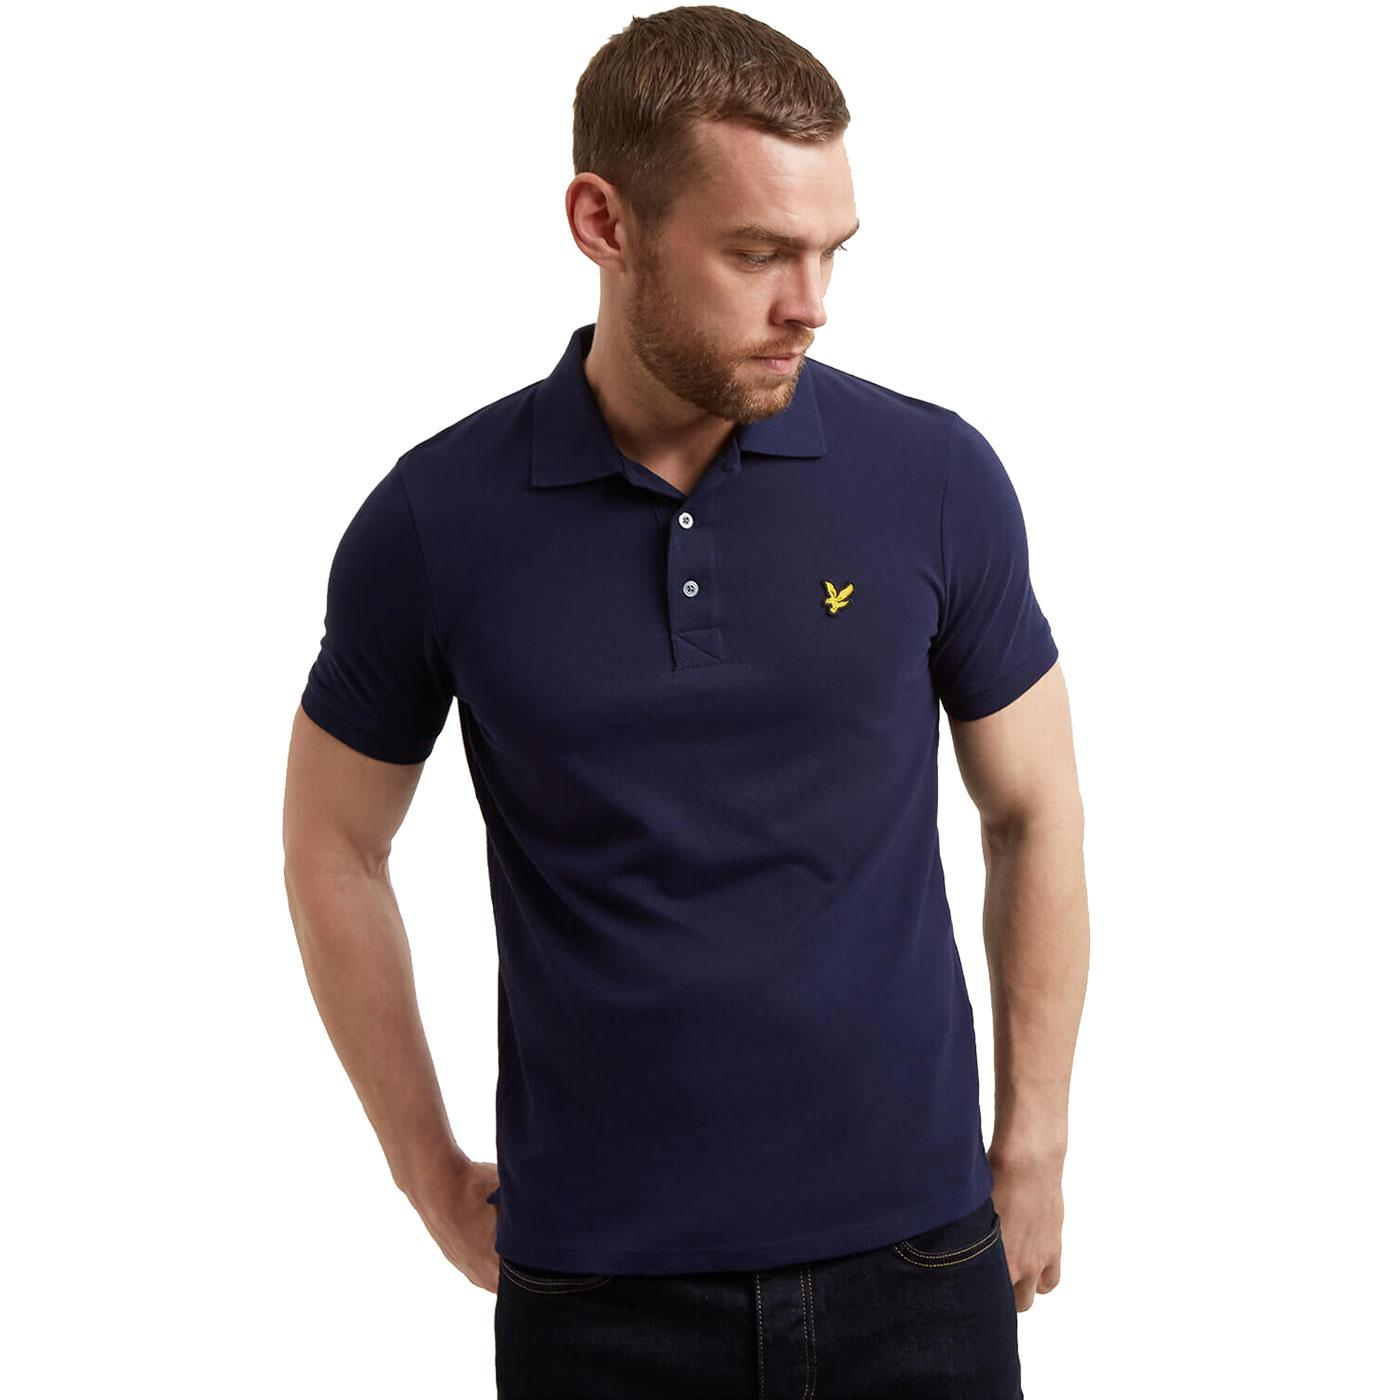 LYLE & SCOTT Mod Classic Pique Polo Shirt NAVY